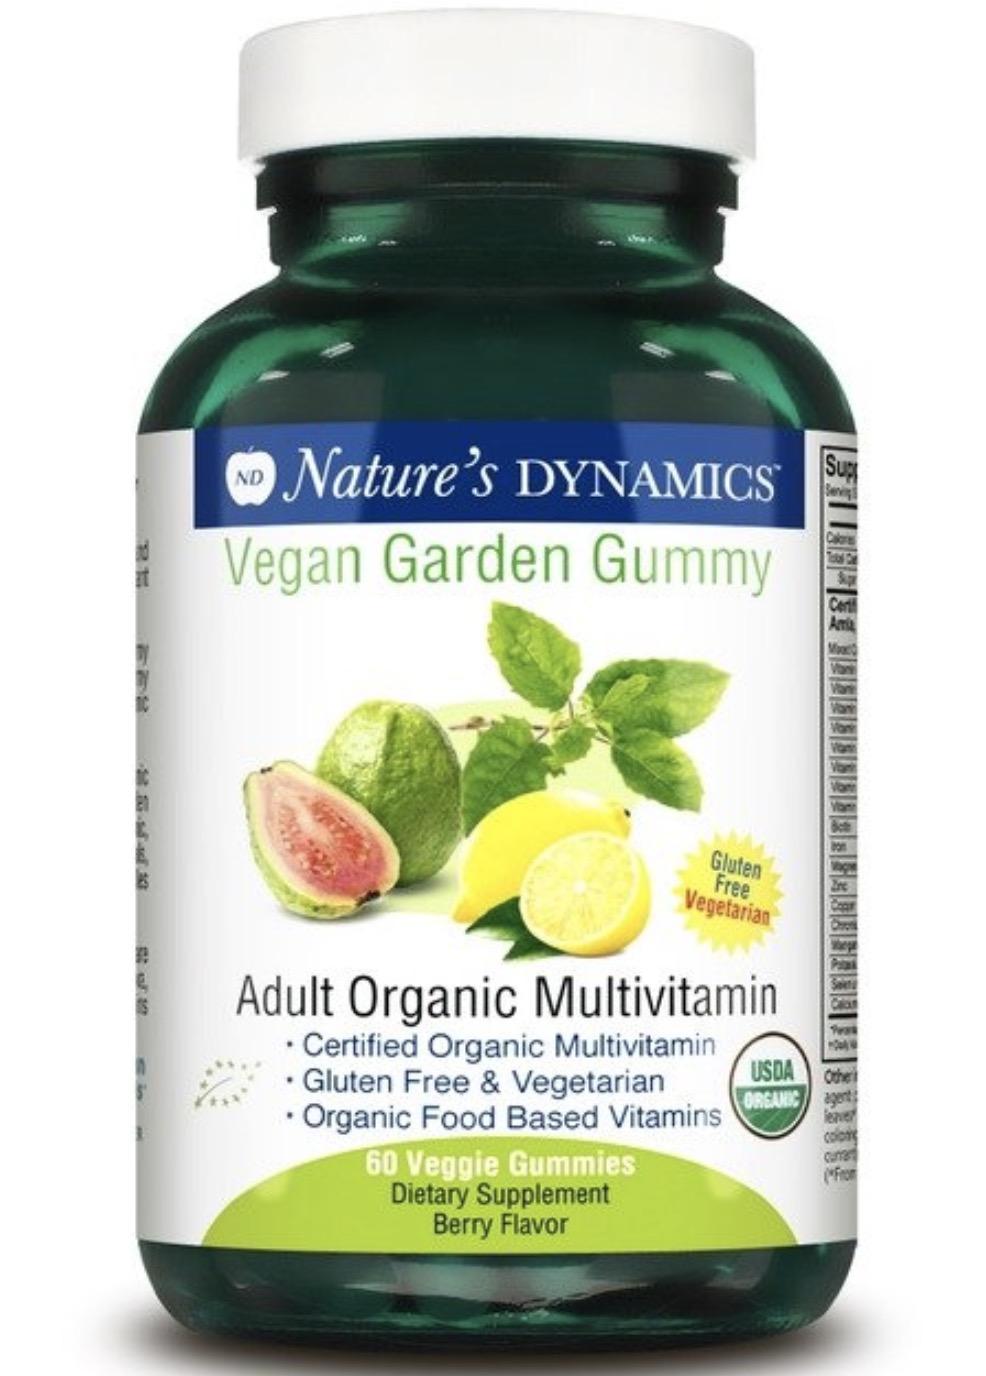 Natures Dynamics Vegan Garden Gummy Adult Organic Multivitamin